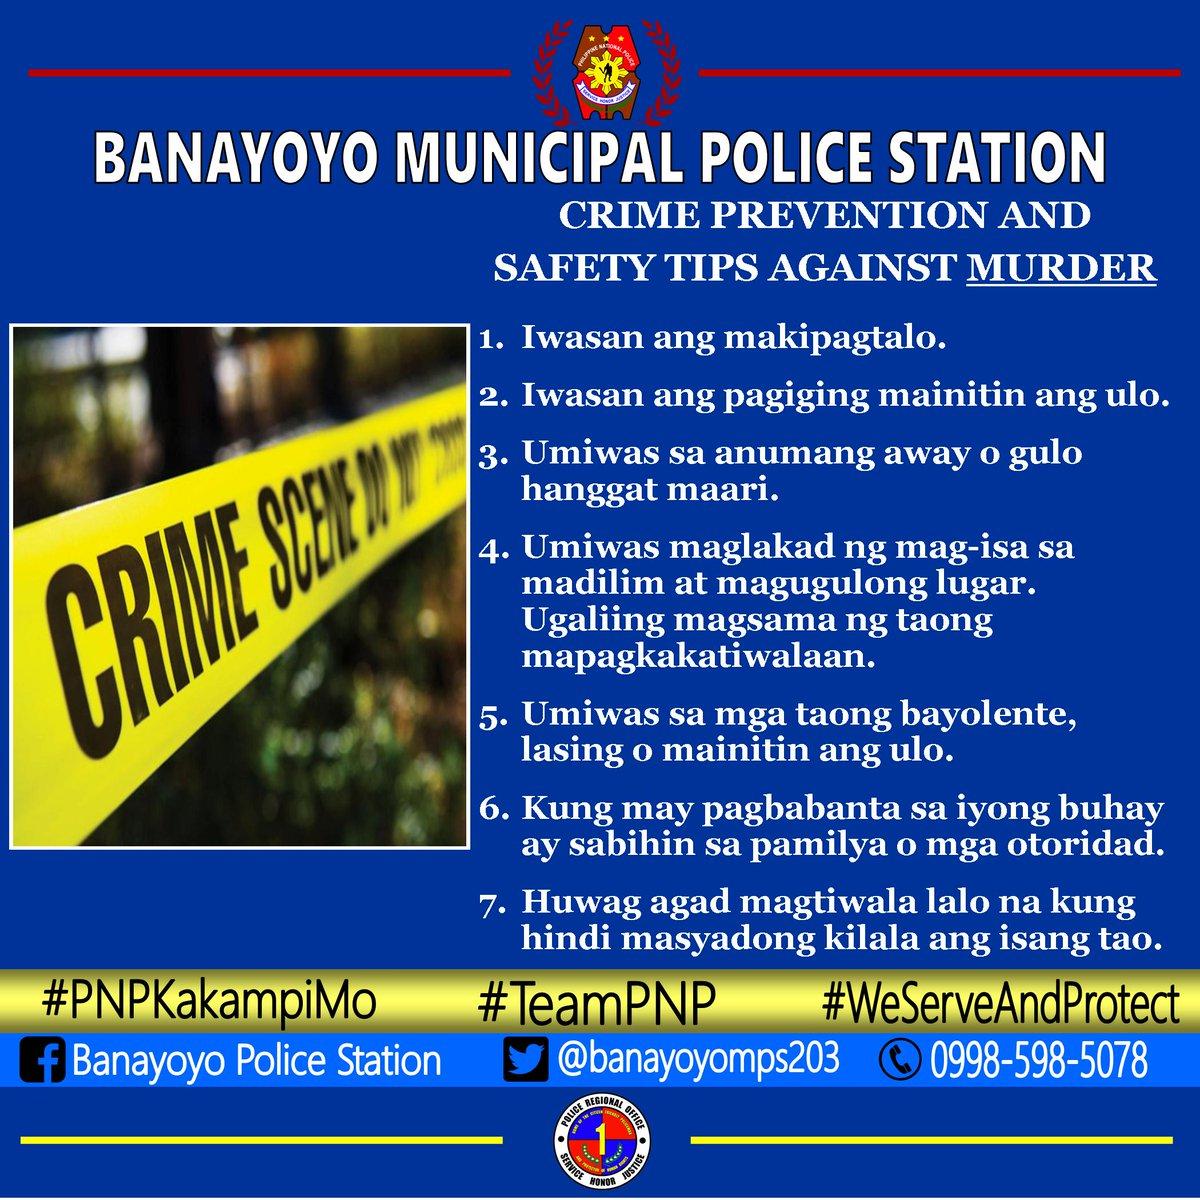 @pnpdpcr @pro1officialtw Crime Prevention and Safety Tips Against Murder #PNP #IlocosSurProvincialOffice #IlocosSur #GovRyanSingson #PBGENRodolfoAzurin #PNPChiefDeboldSinas #PCOLWilsonDoromal #WilsonDoromalPNPDiary #TripleIMPACTStrategy #PNPPRO1 #PRO1 #PatrolPlan2030 #teamvoltesV